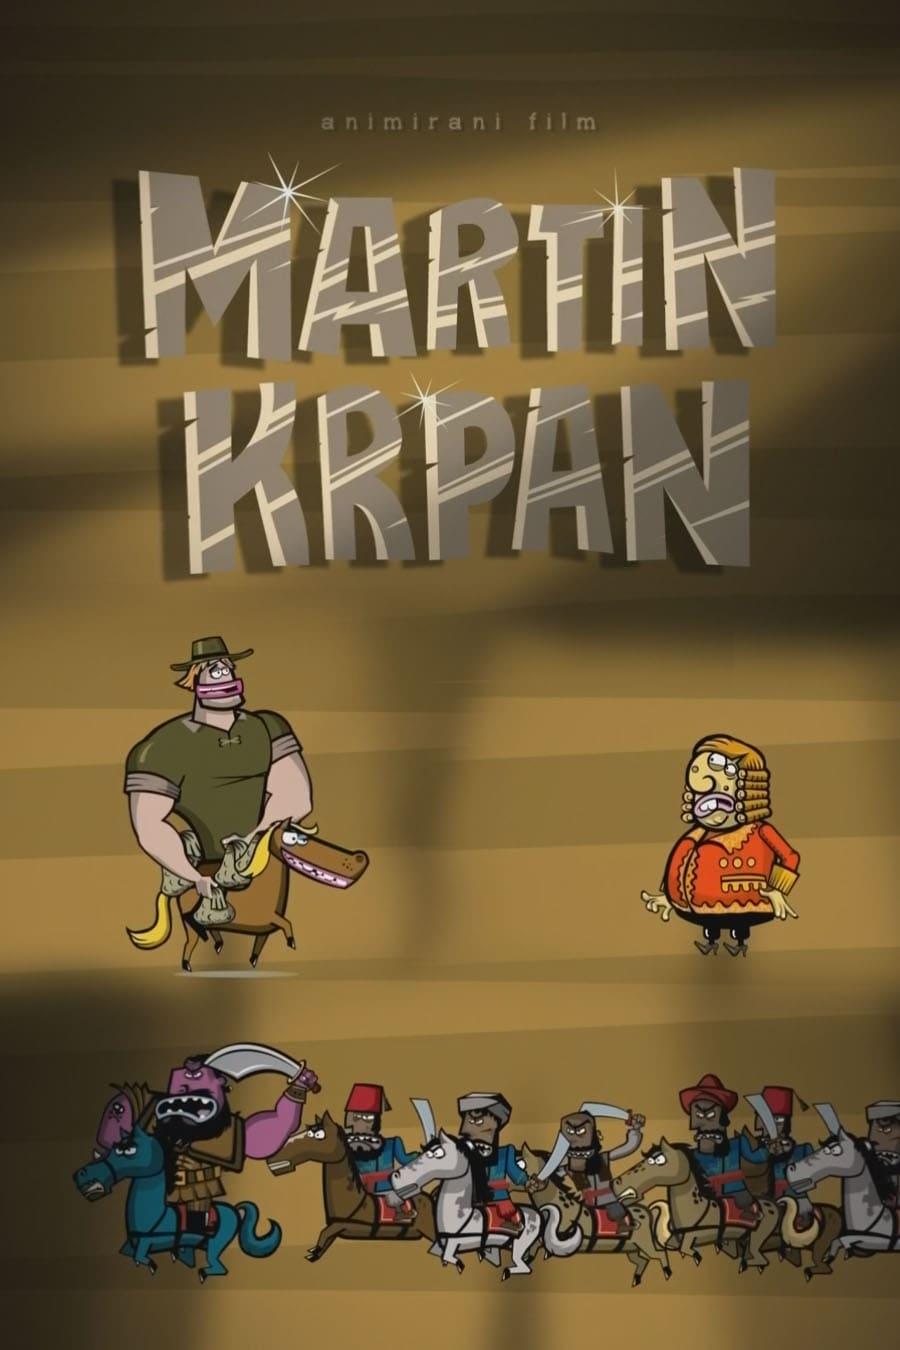 watch Martin Krpan 2017 Stream online free